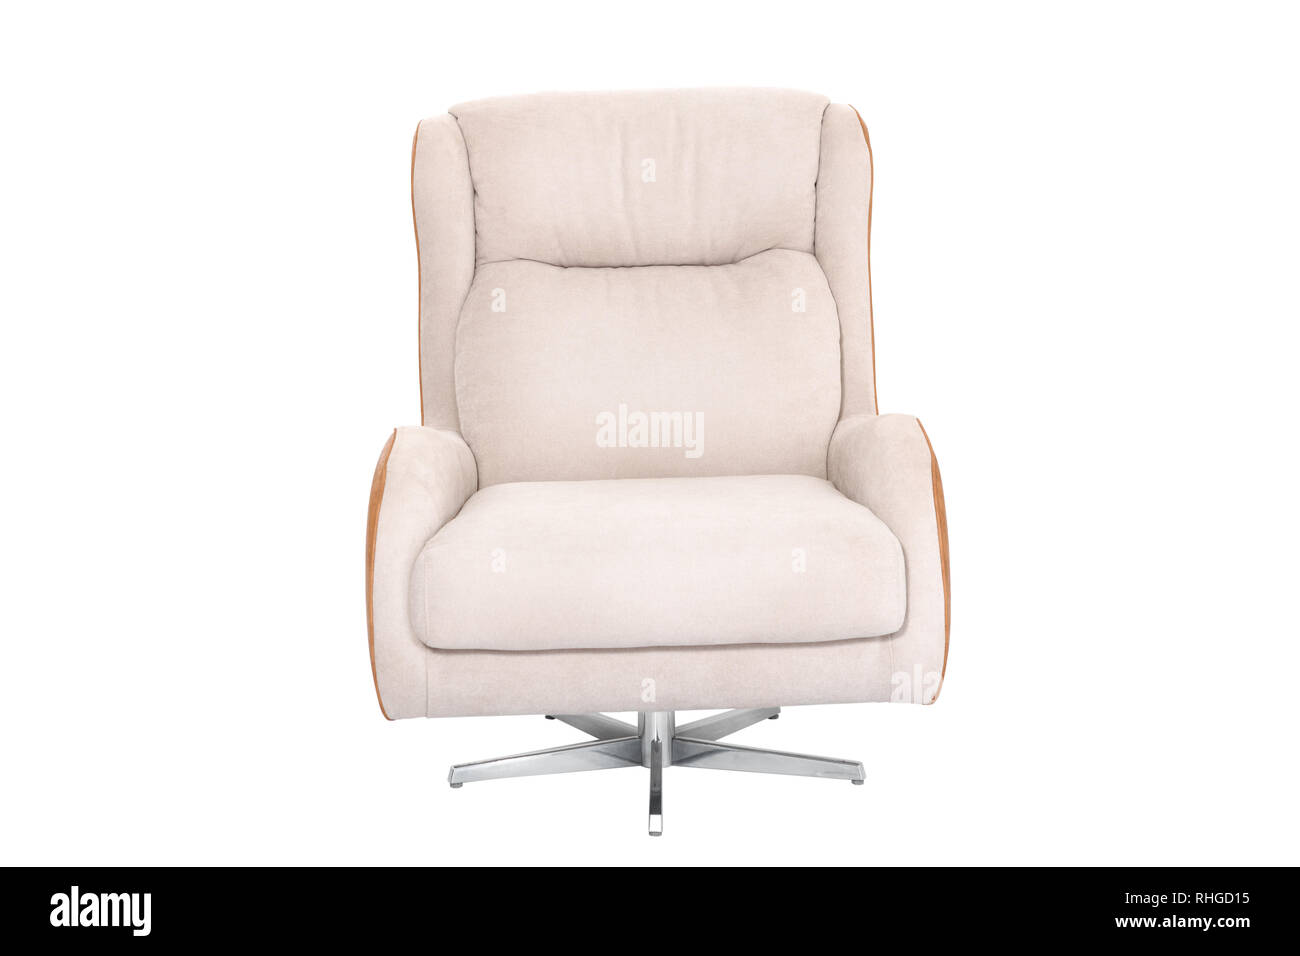 armchair modern designer chair on white background texture chair RHGD15